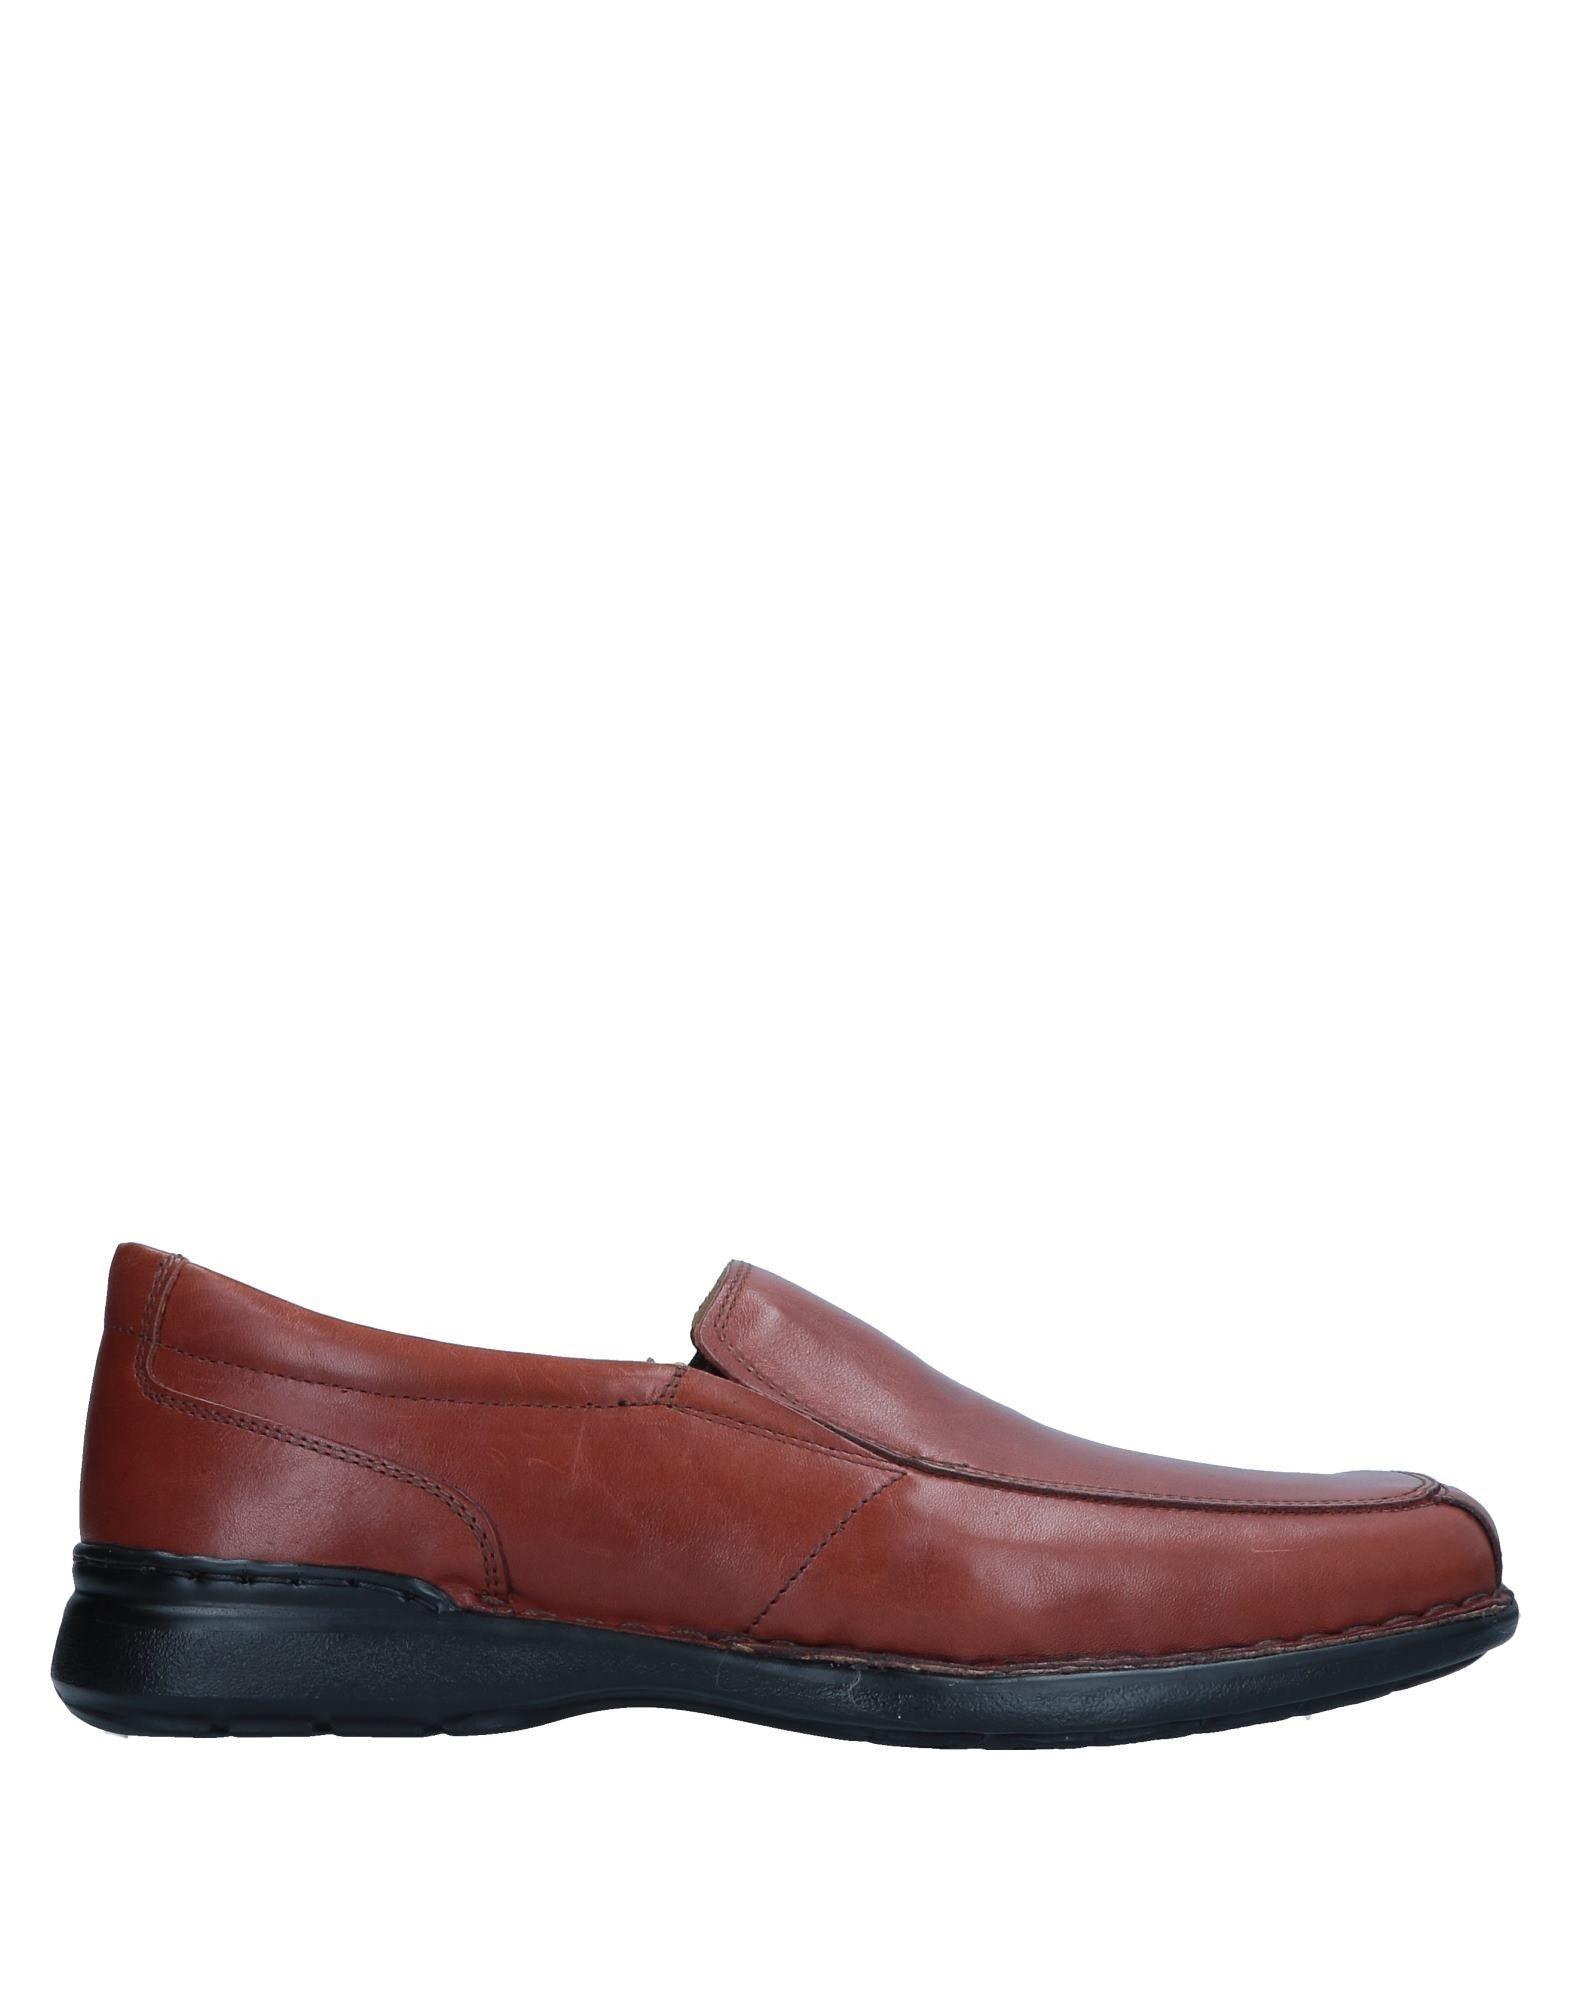 Rabatt echte Mokassins Schuhe Valleverde Mokassins echte Herren  11554676FG 2bfa7e